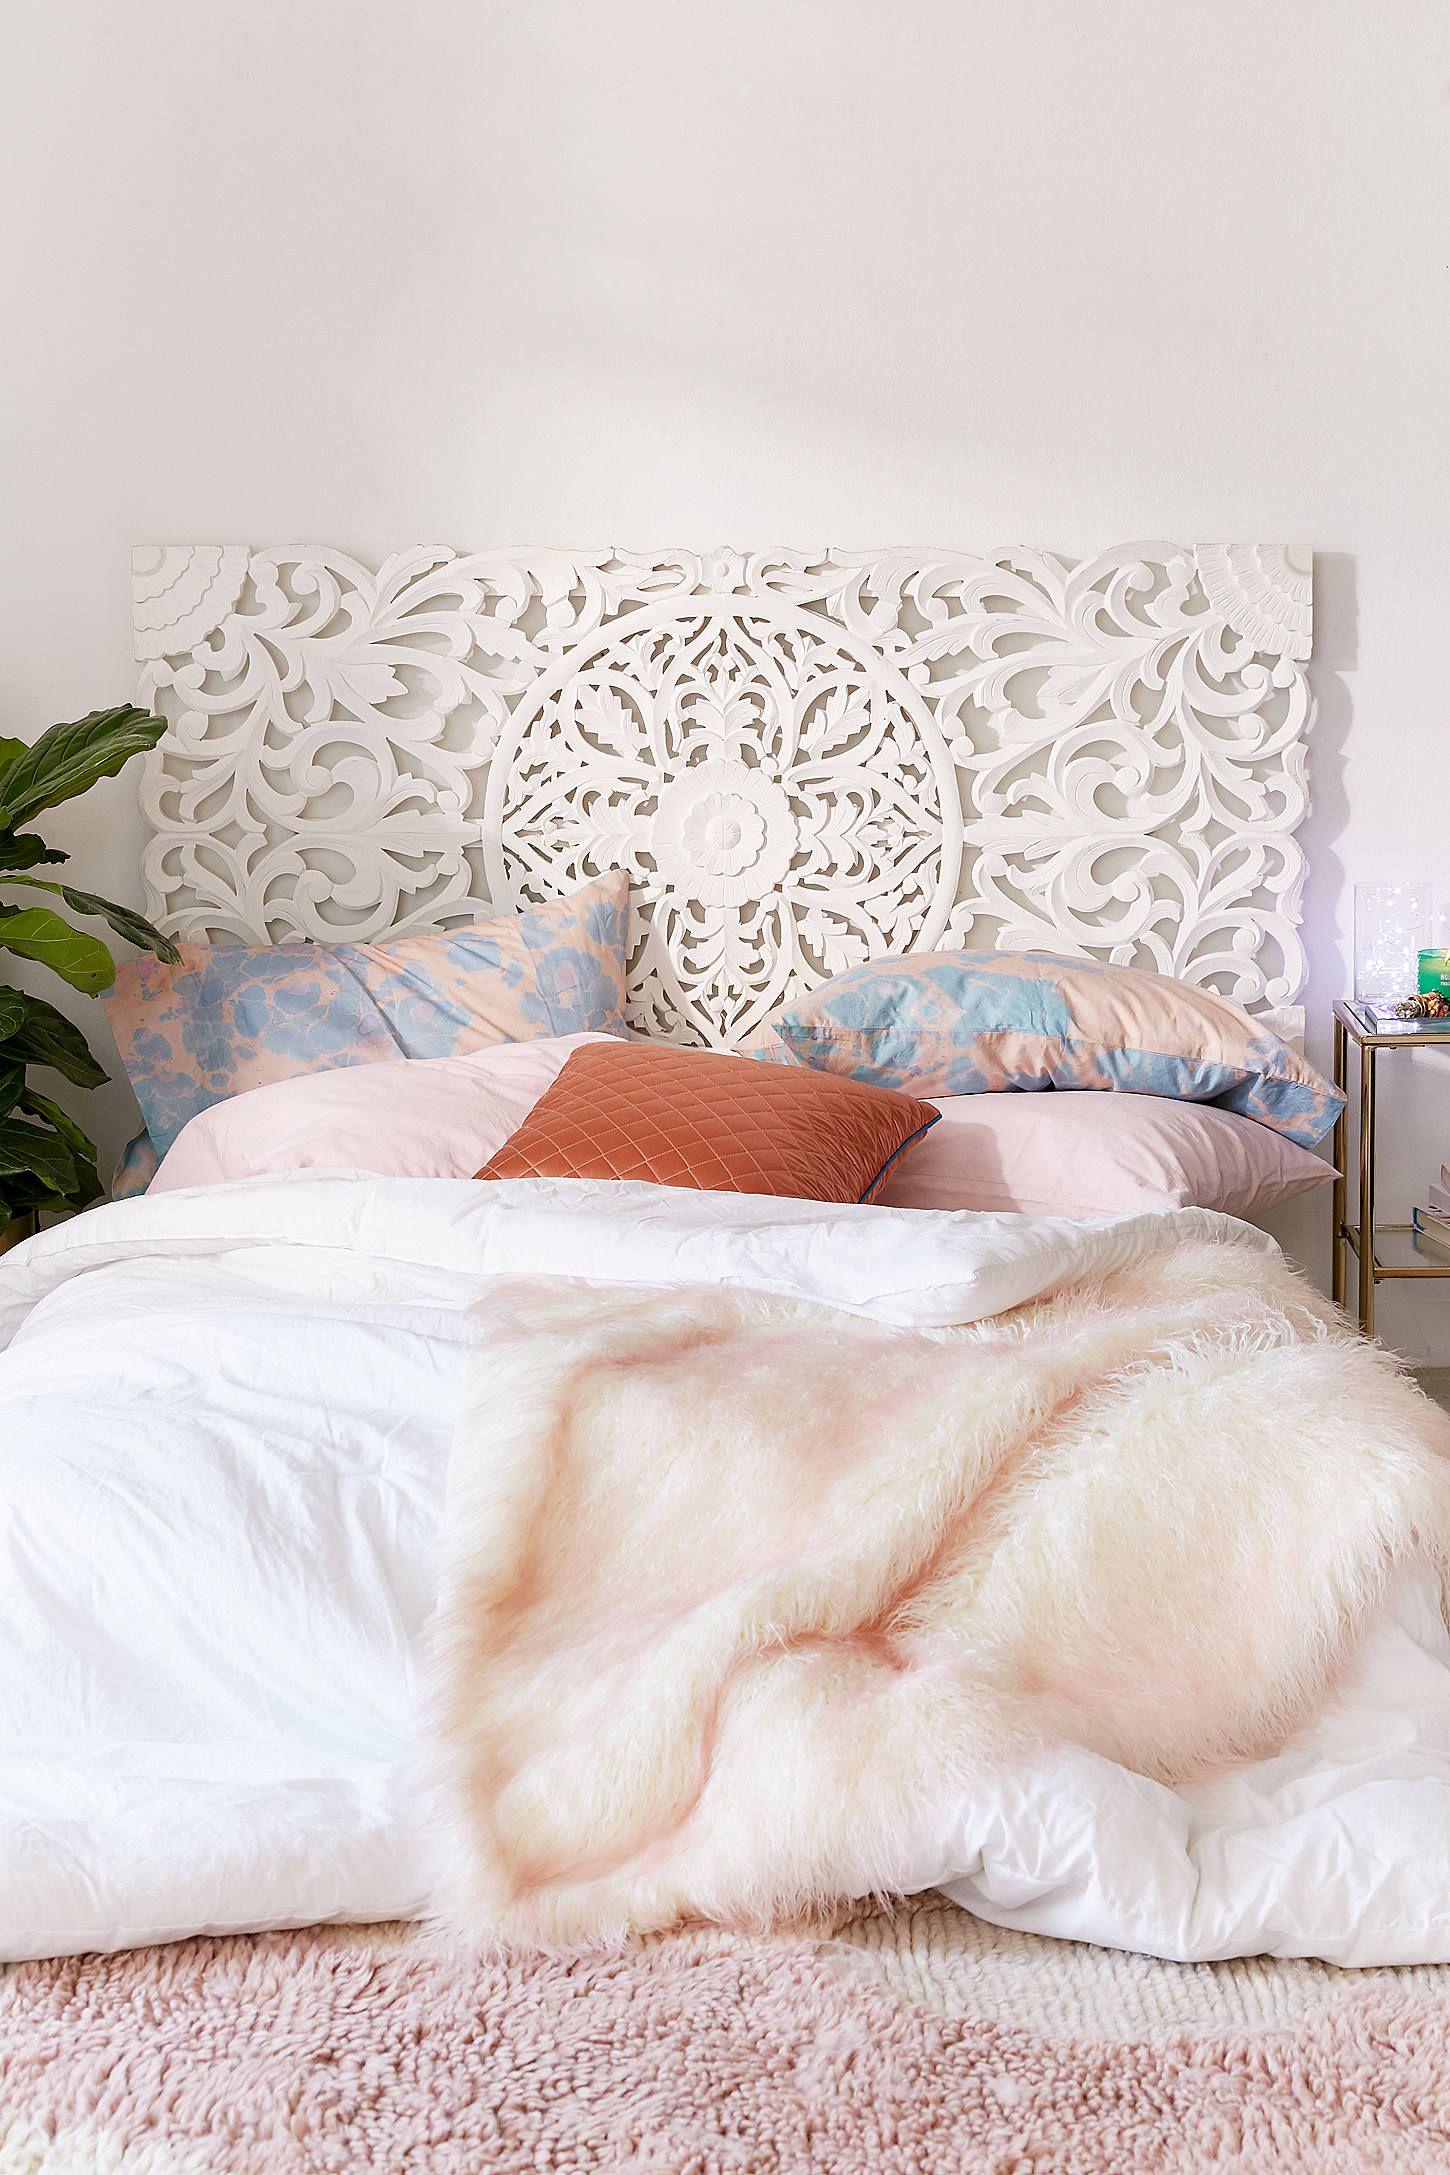 urban outfitters sienna headboard on sienna headboard pretty headboard home decor bedroom urban outfitters bedroom pinterest